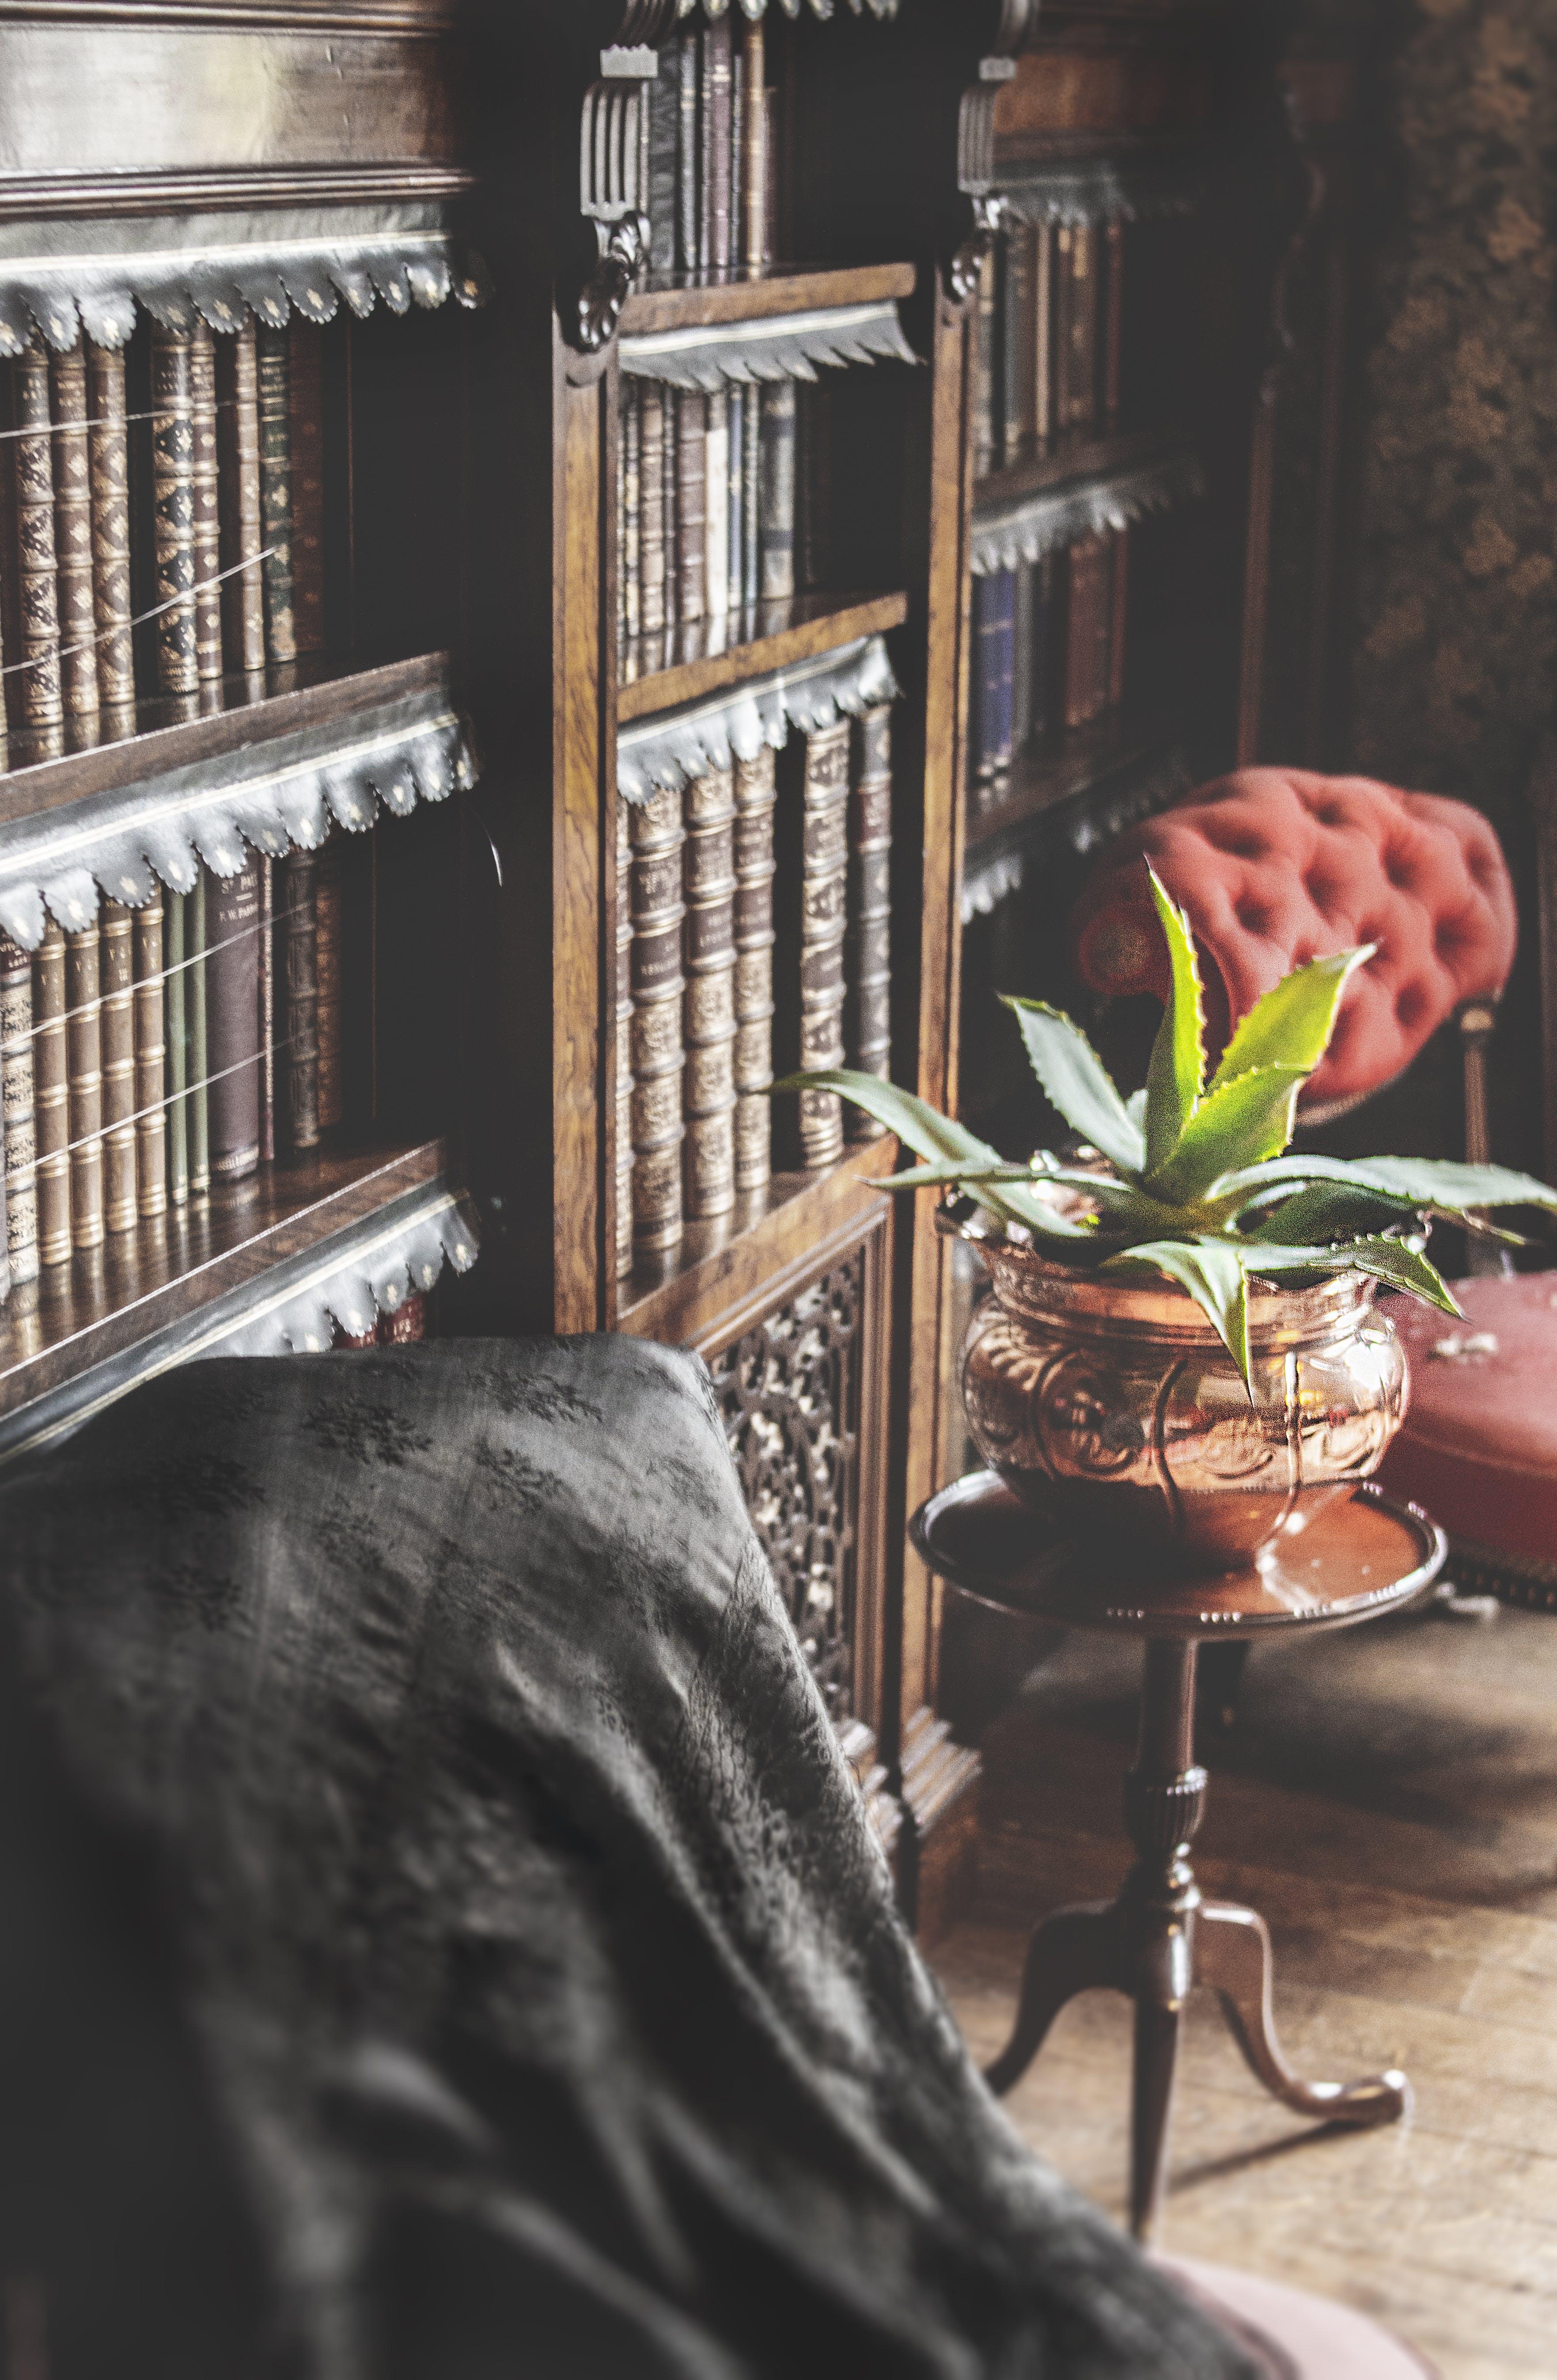 Green Leafed Plant Beside Book Shelf